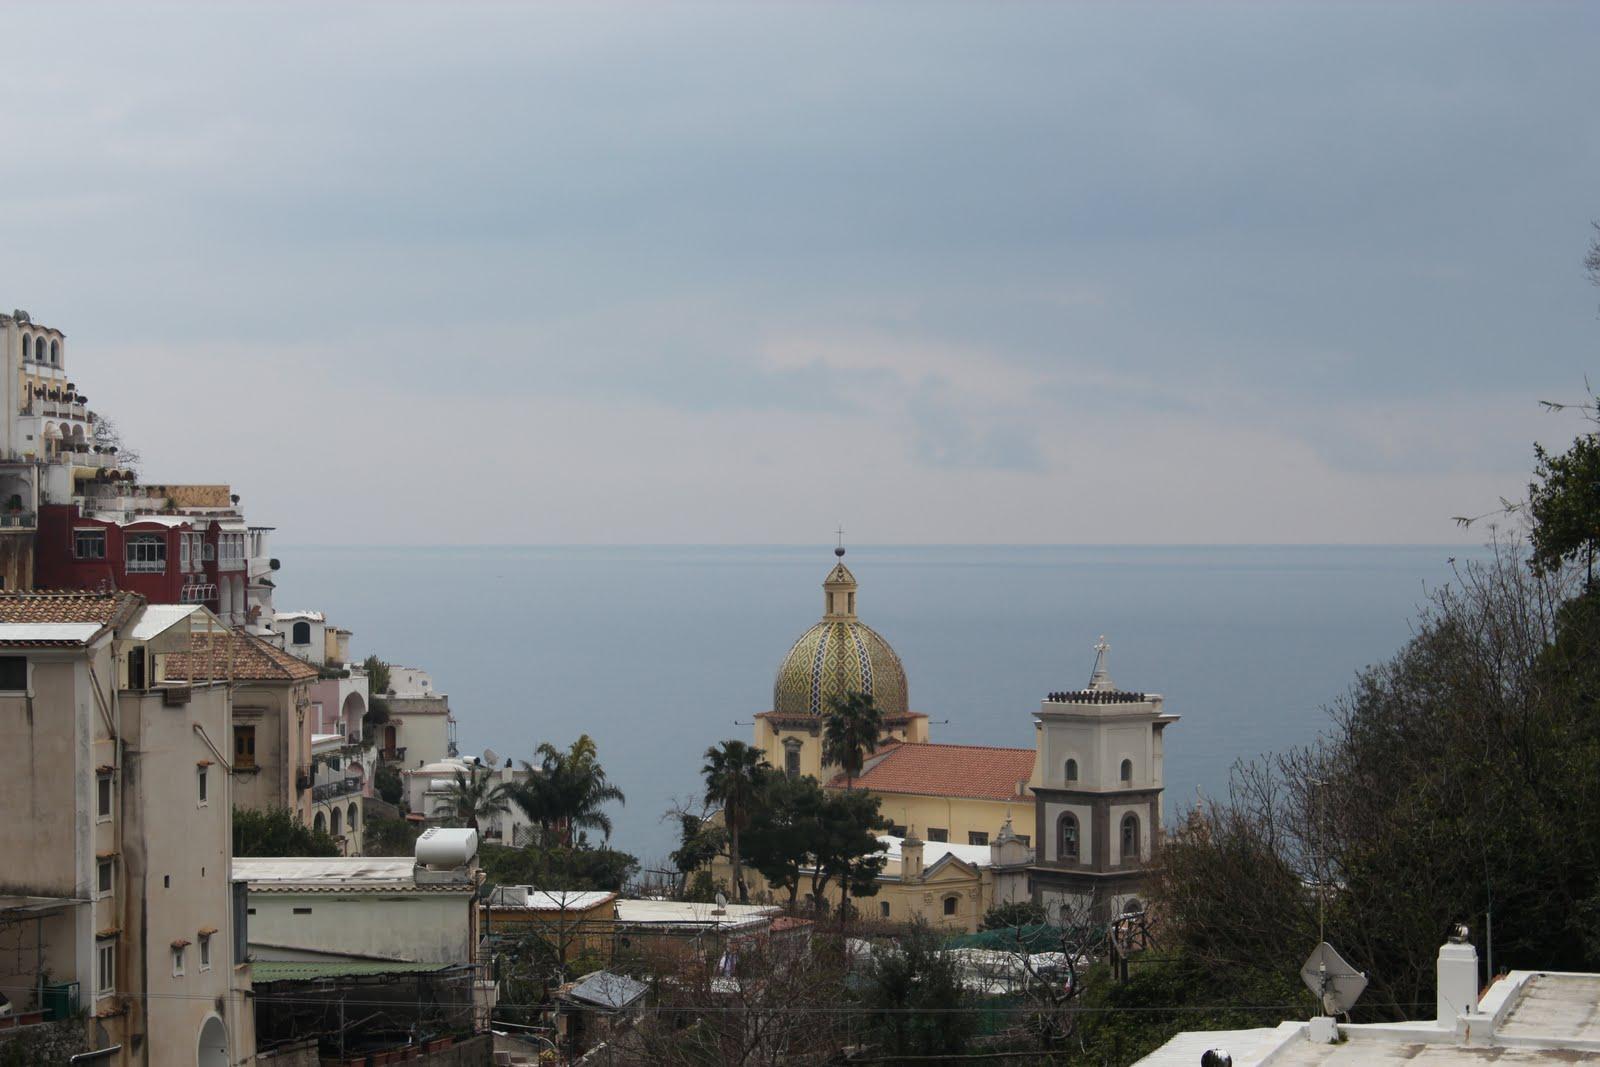 http://1.bp.blogspot.com/-ImykaPMLJGc/TagtaV2NTcI/AAAAAAAAA_w/mtzHz3KZ6XI/s1600/Amalfi+Coast%252C+Positano%252C+Town+view+of+the+dome.JPG